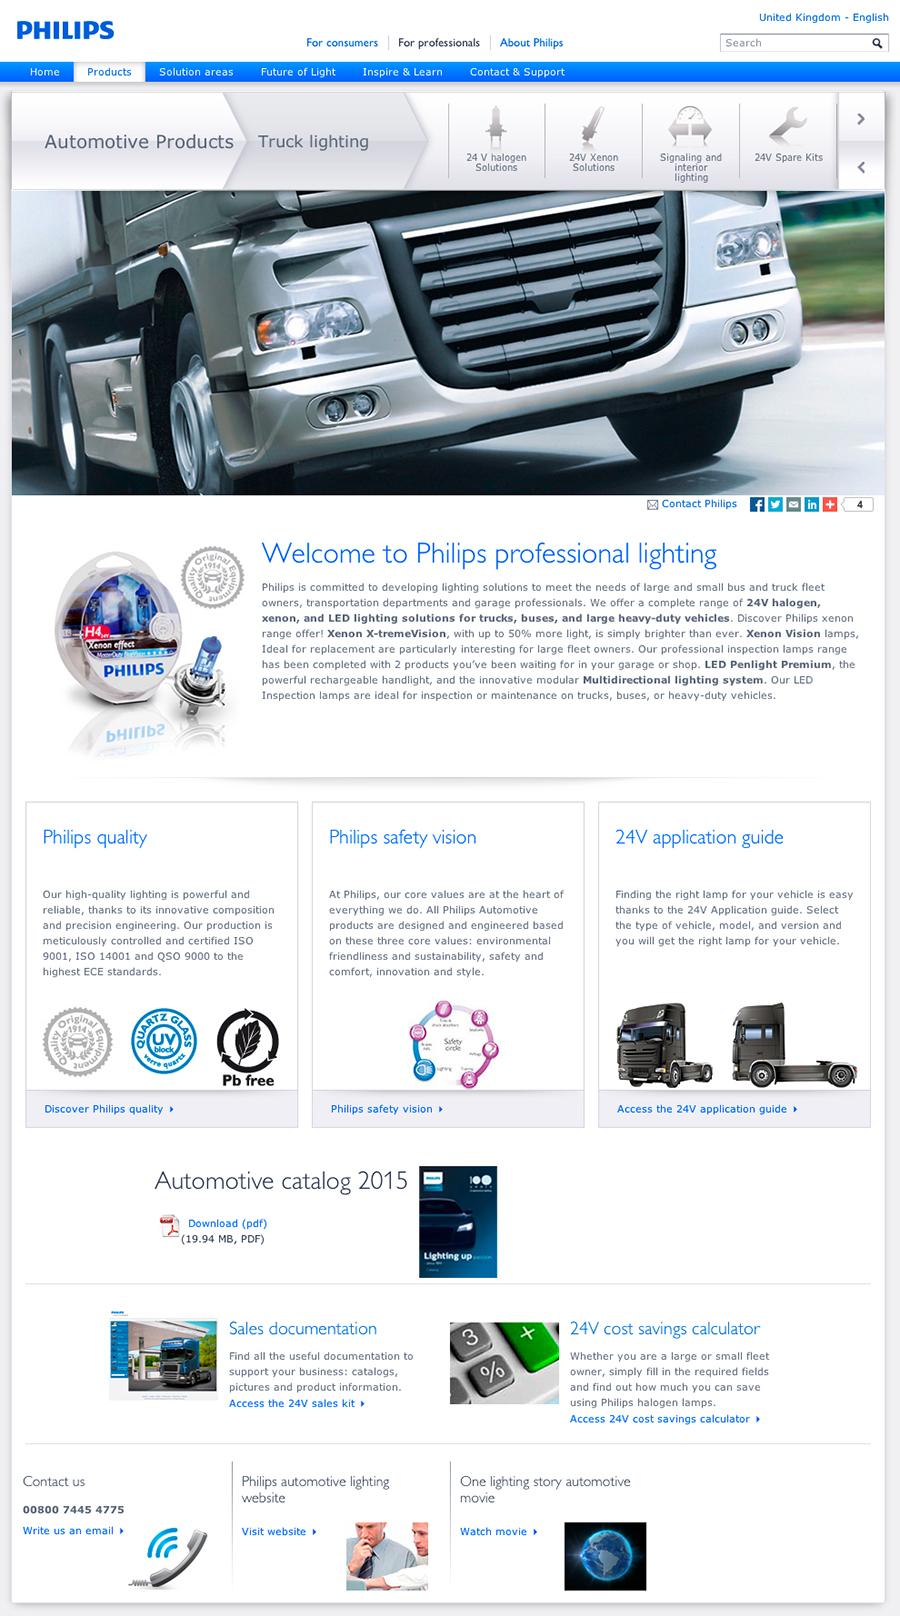 philips automotive lighting catalog pdf lilianduval. Black Bedroom Furniture Sets. Home Design Ideas